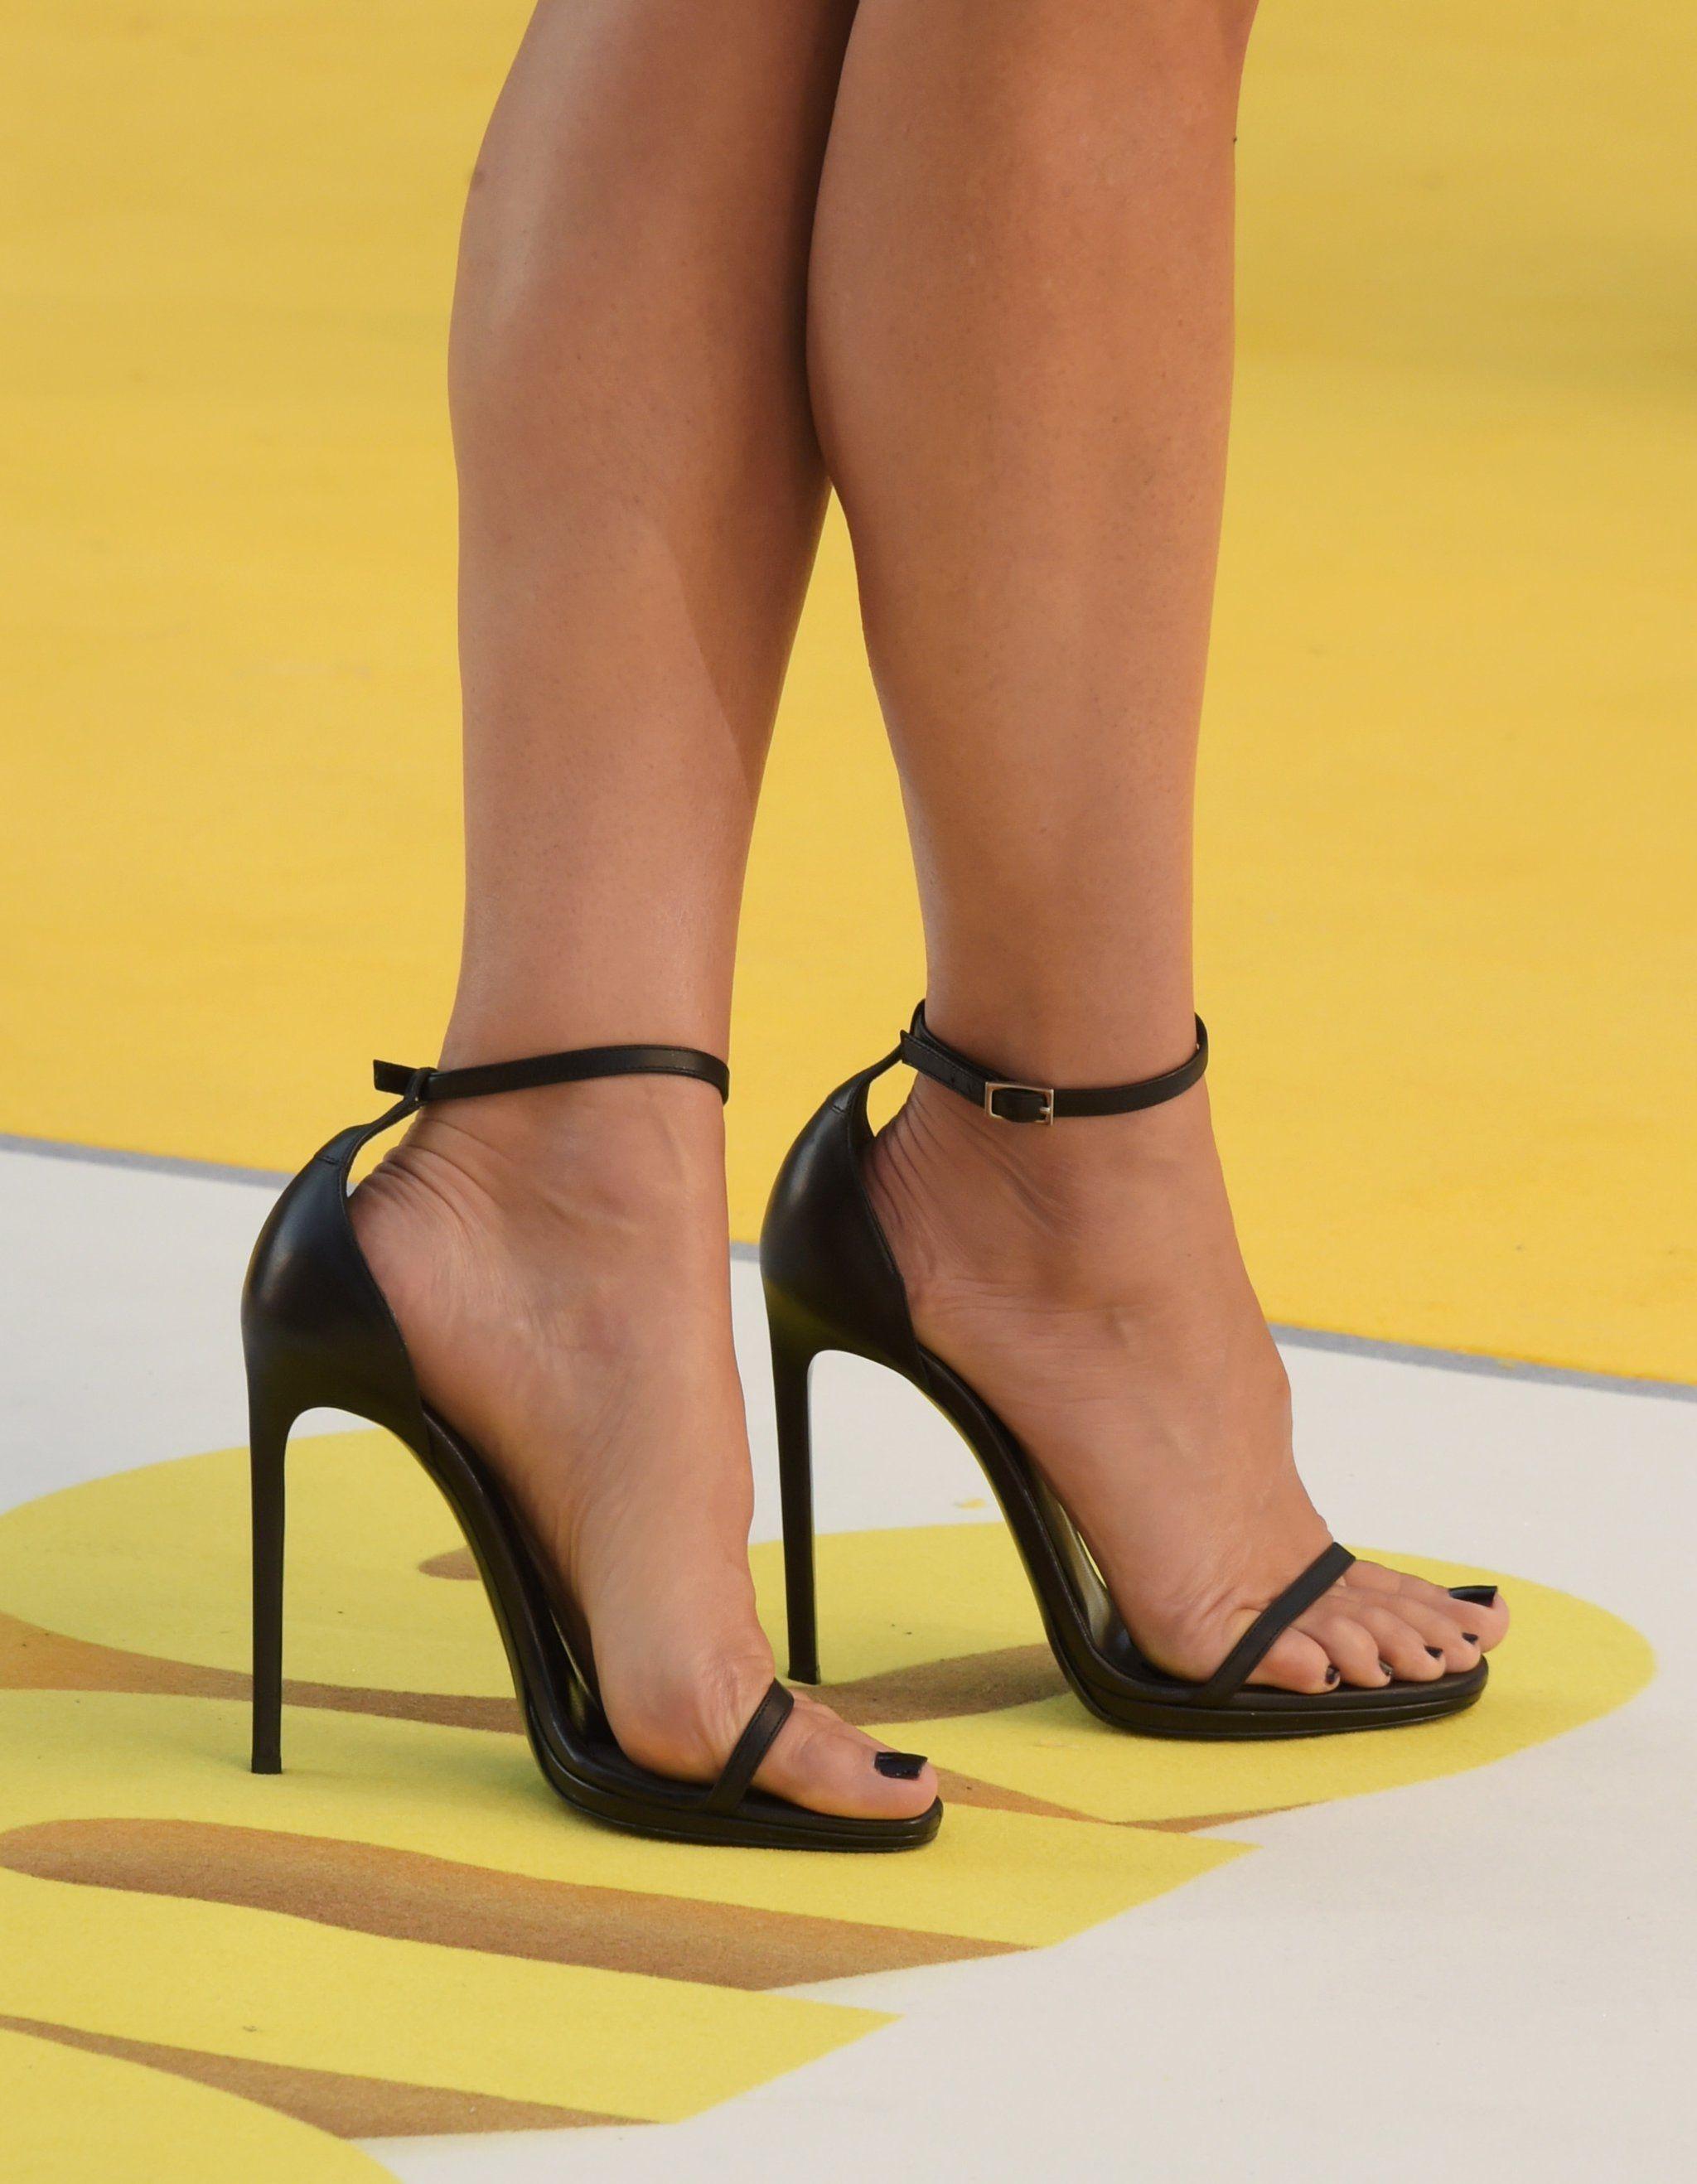 see through Feet Sandra Bullock naked photo 2017